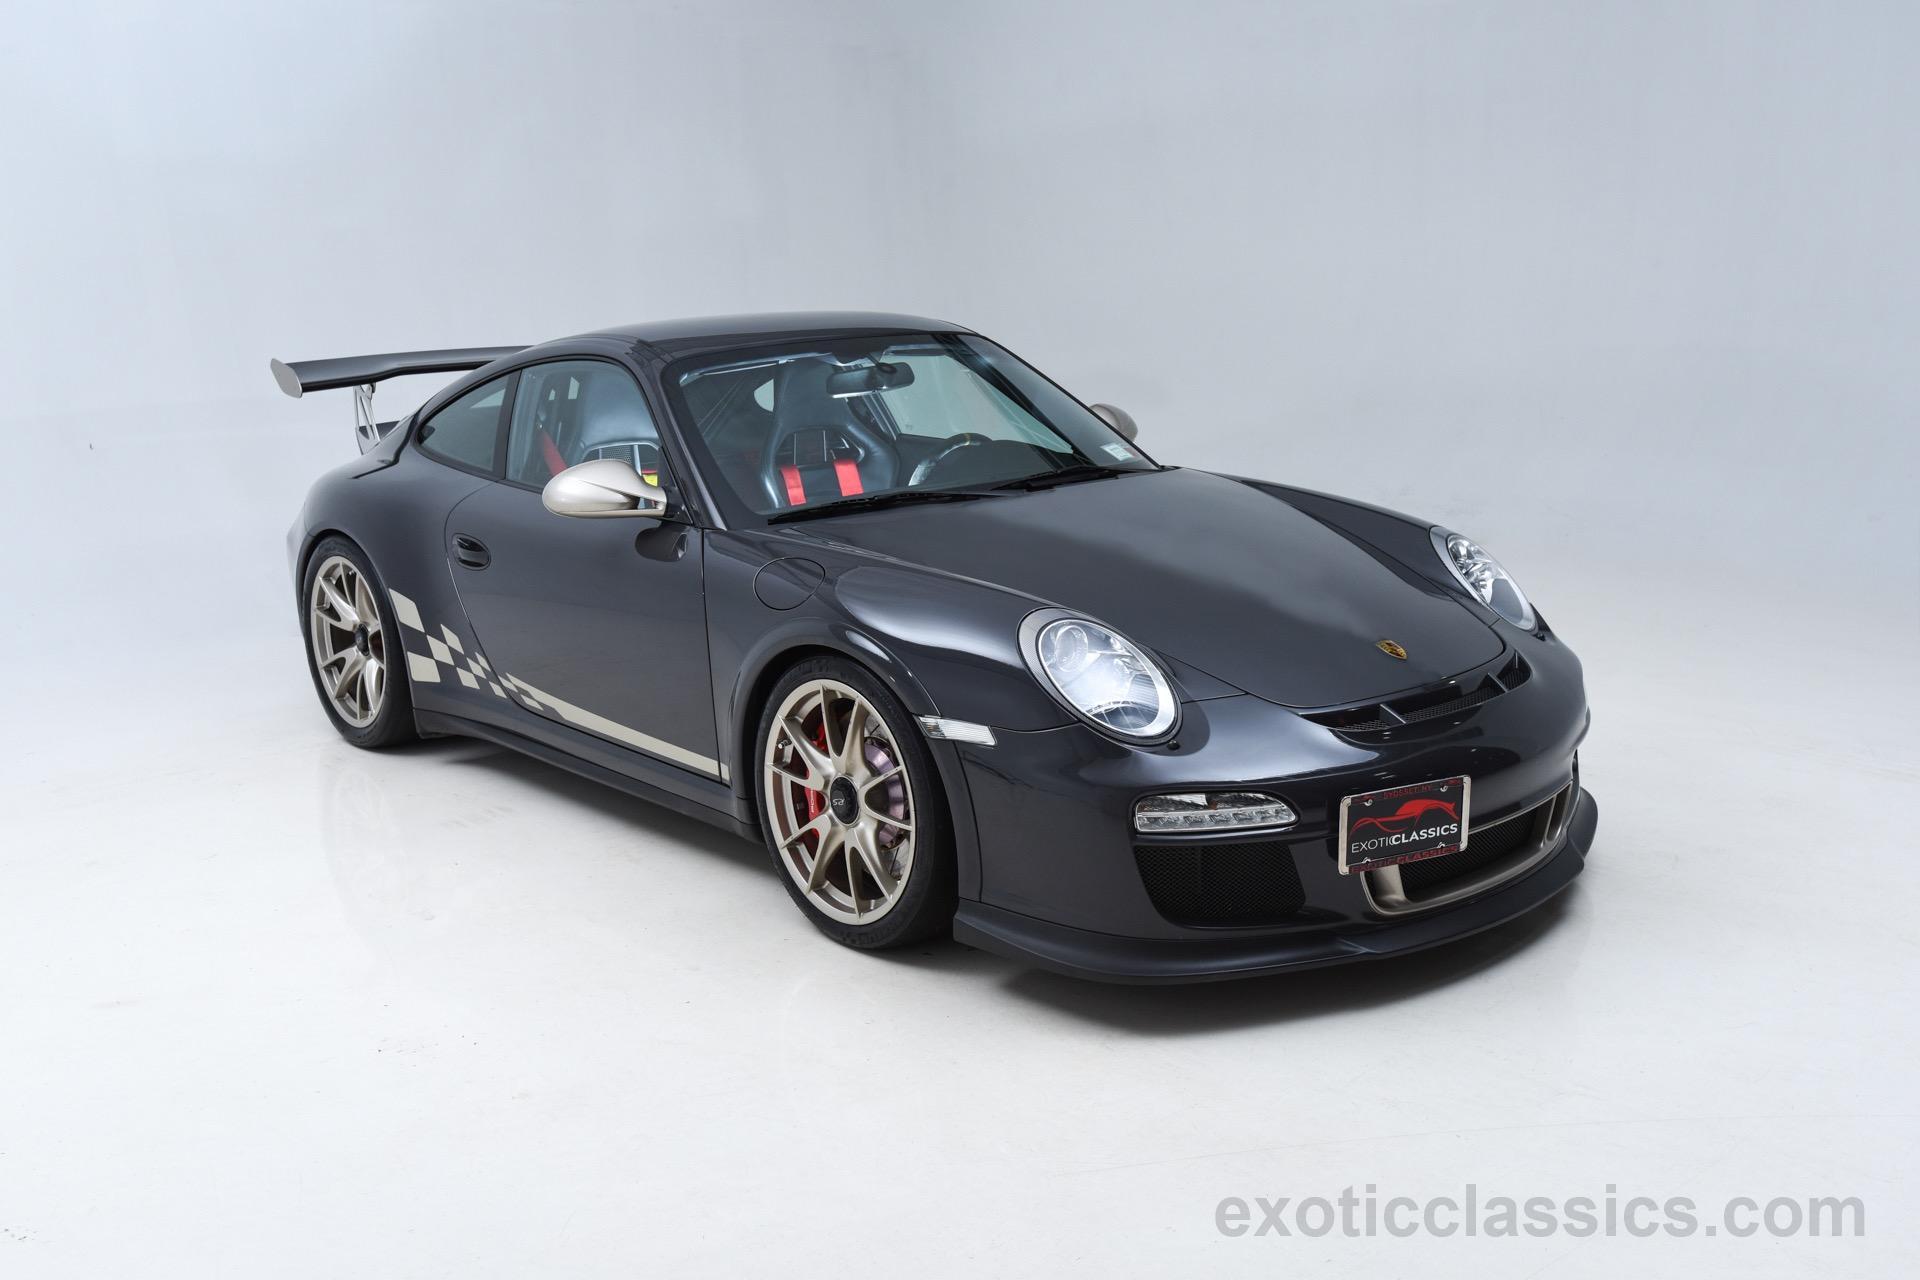 2010 porsche 911 gt3 rs gt3 rs exotic classic car. Black Bedroom Furniture Sets. Home Design Ideas